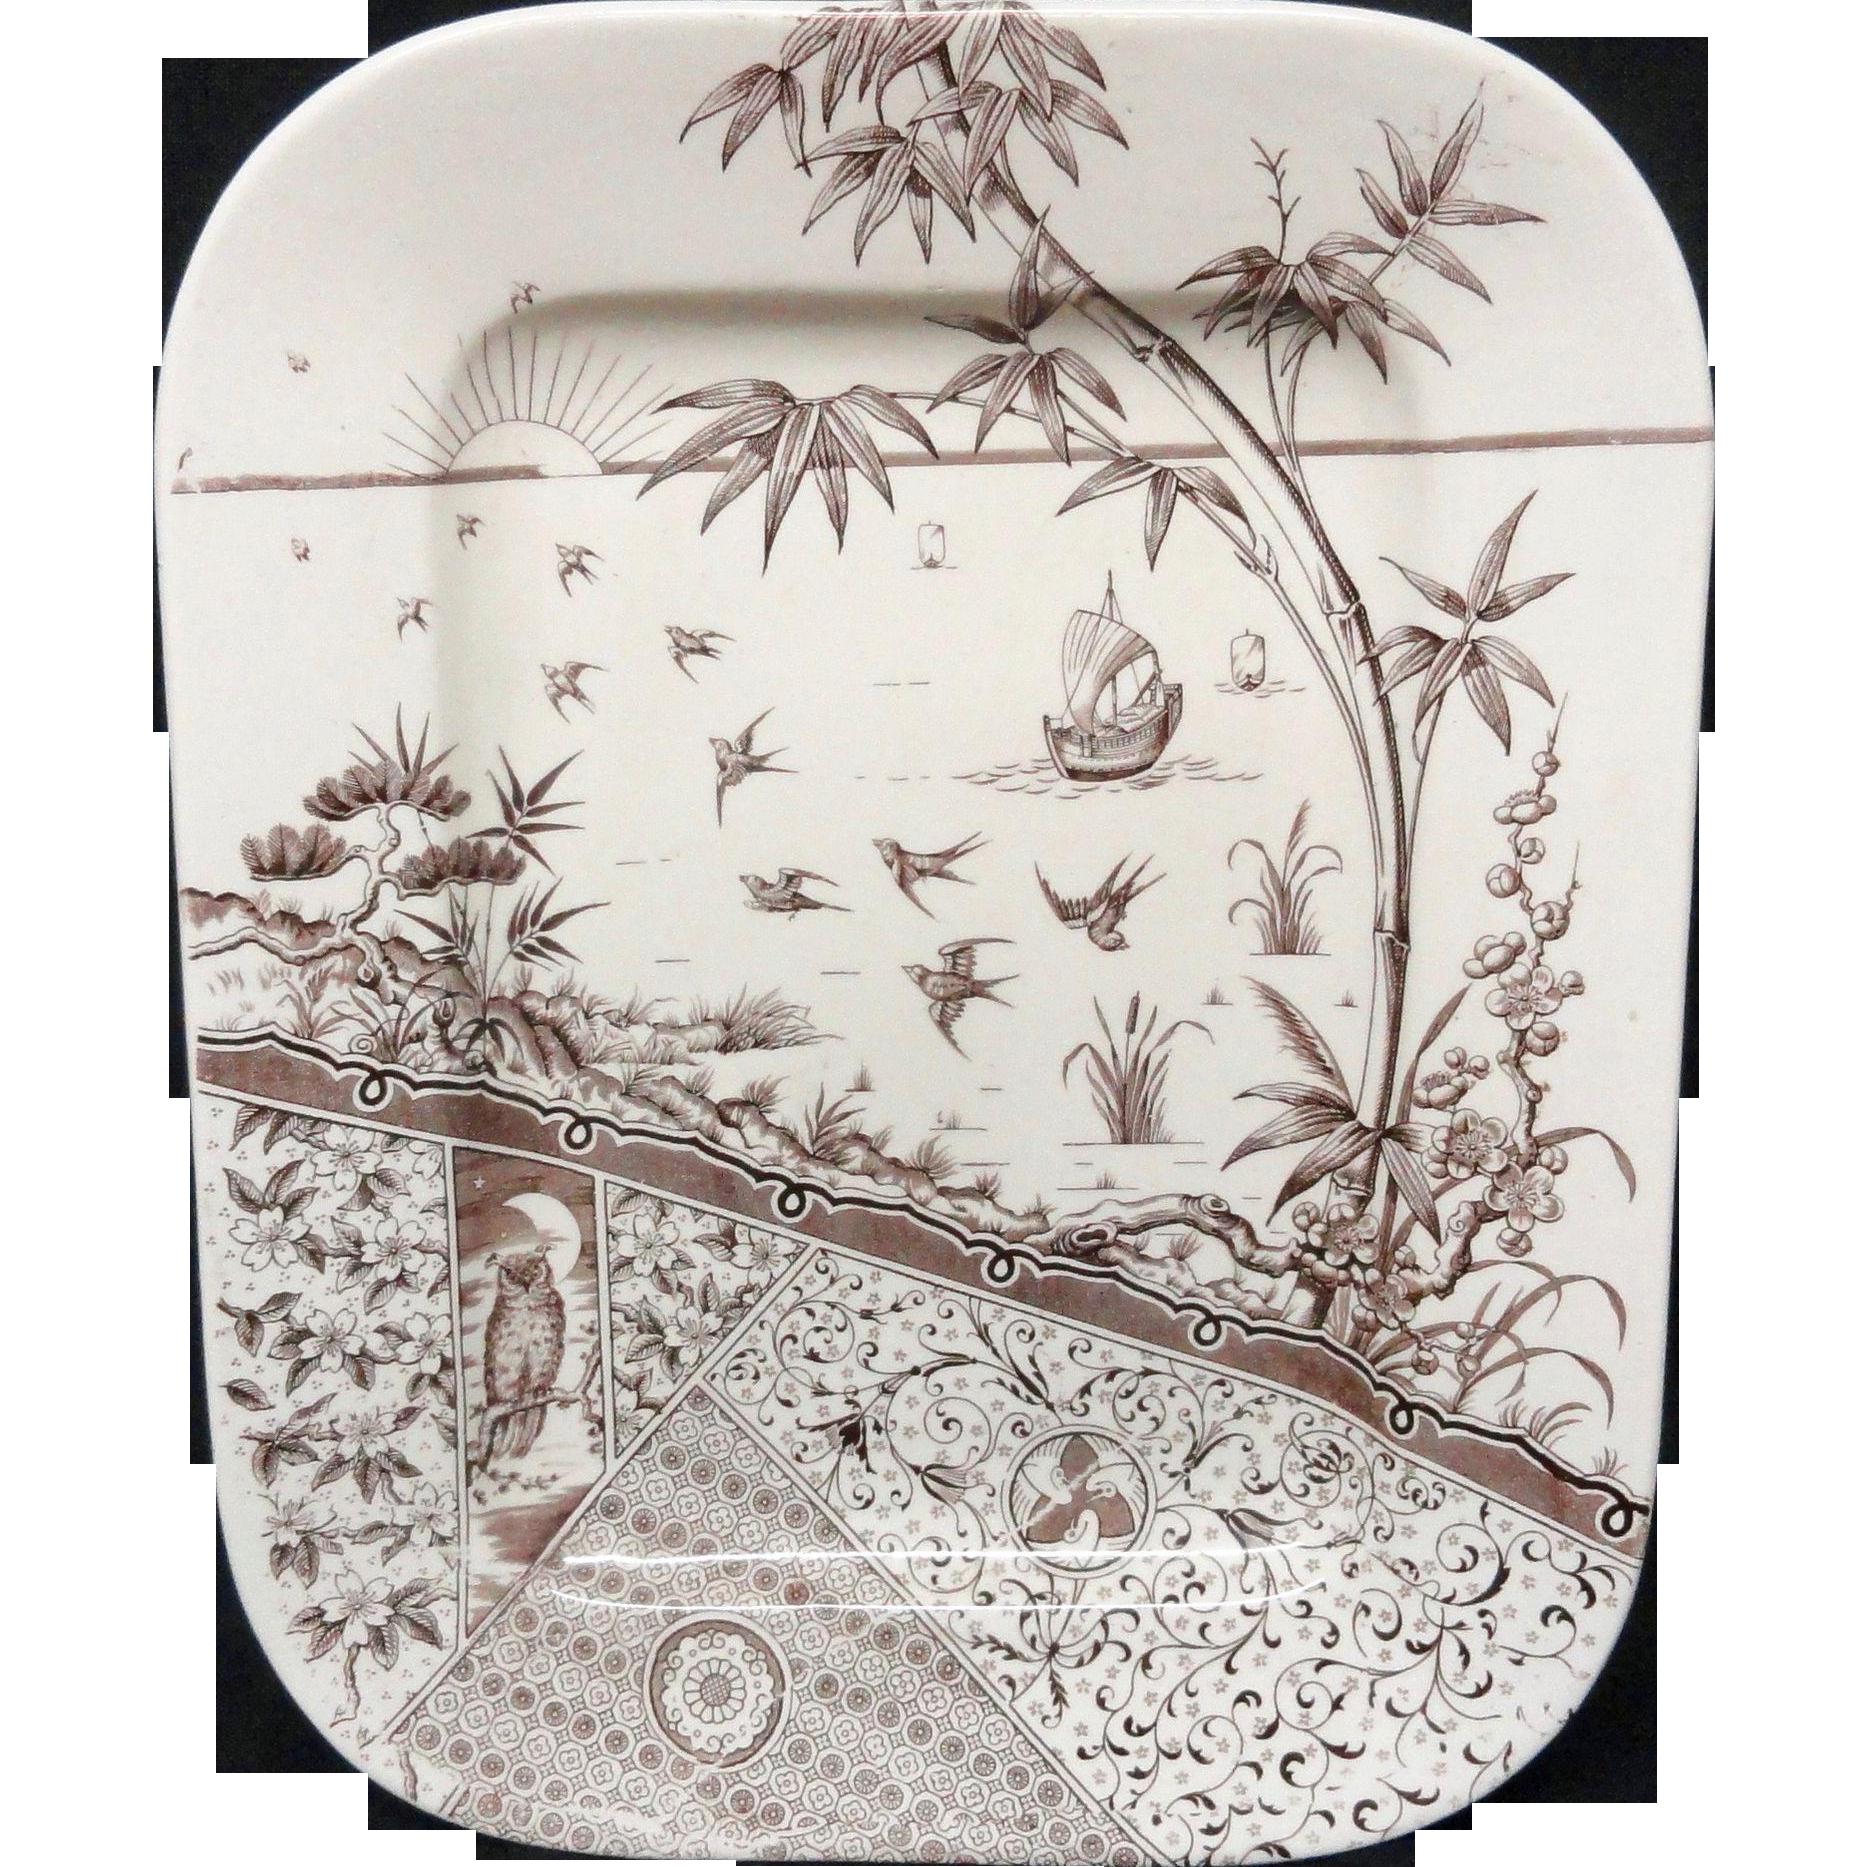 Brown Transferware OWL Staffordshire PLATTER ~ MELBOURNE 1883